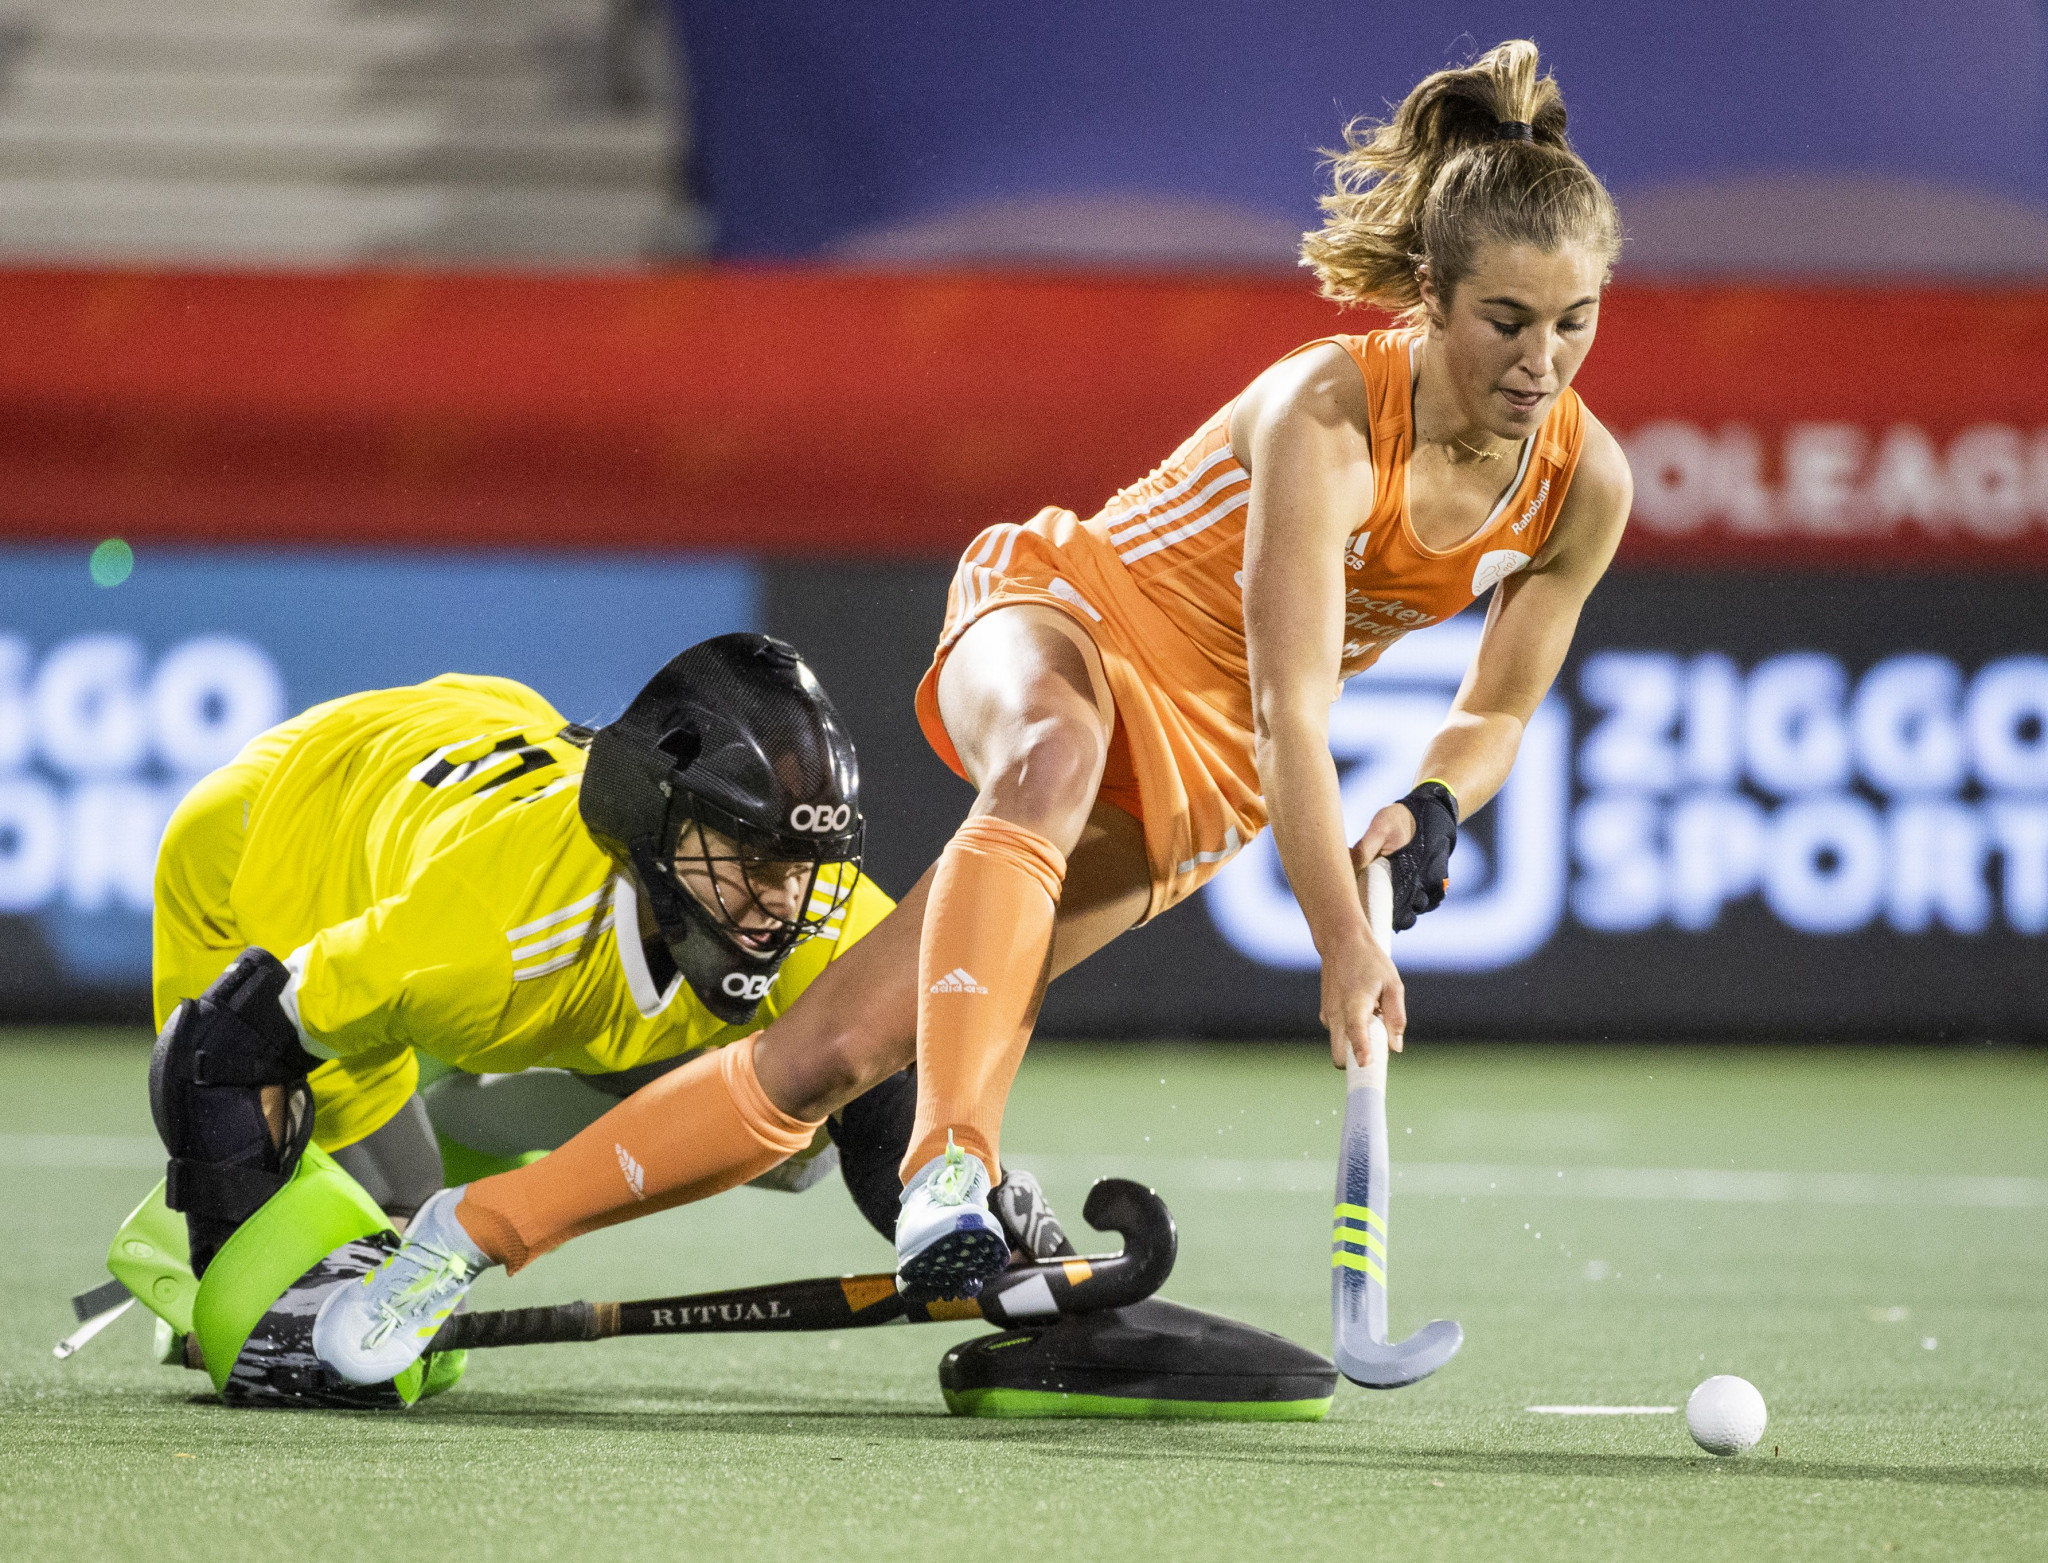 Xan de Waard scored in the shootout for the Dutch women ©Getty Images